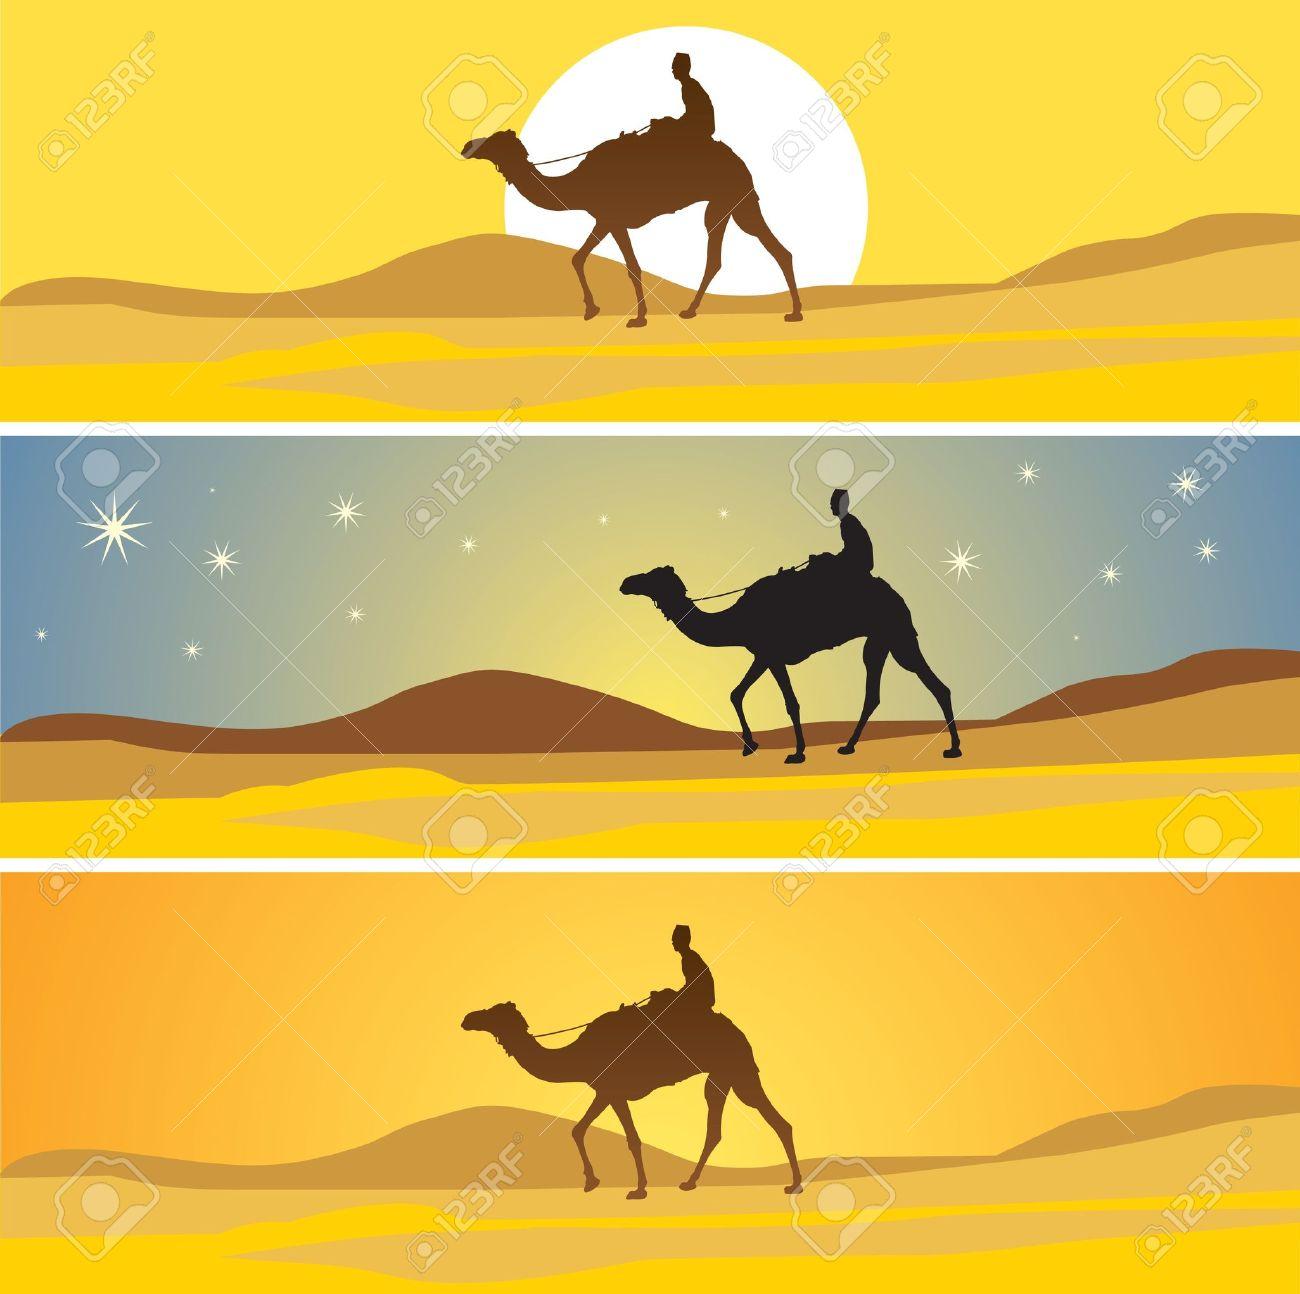 Sahara clipart (5834) Sahara Free Clipartwork Clipart